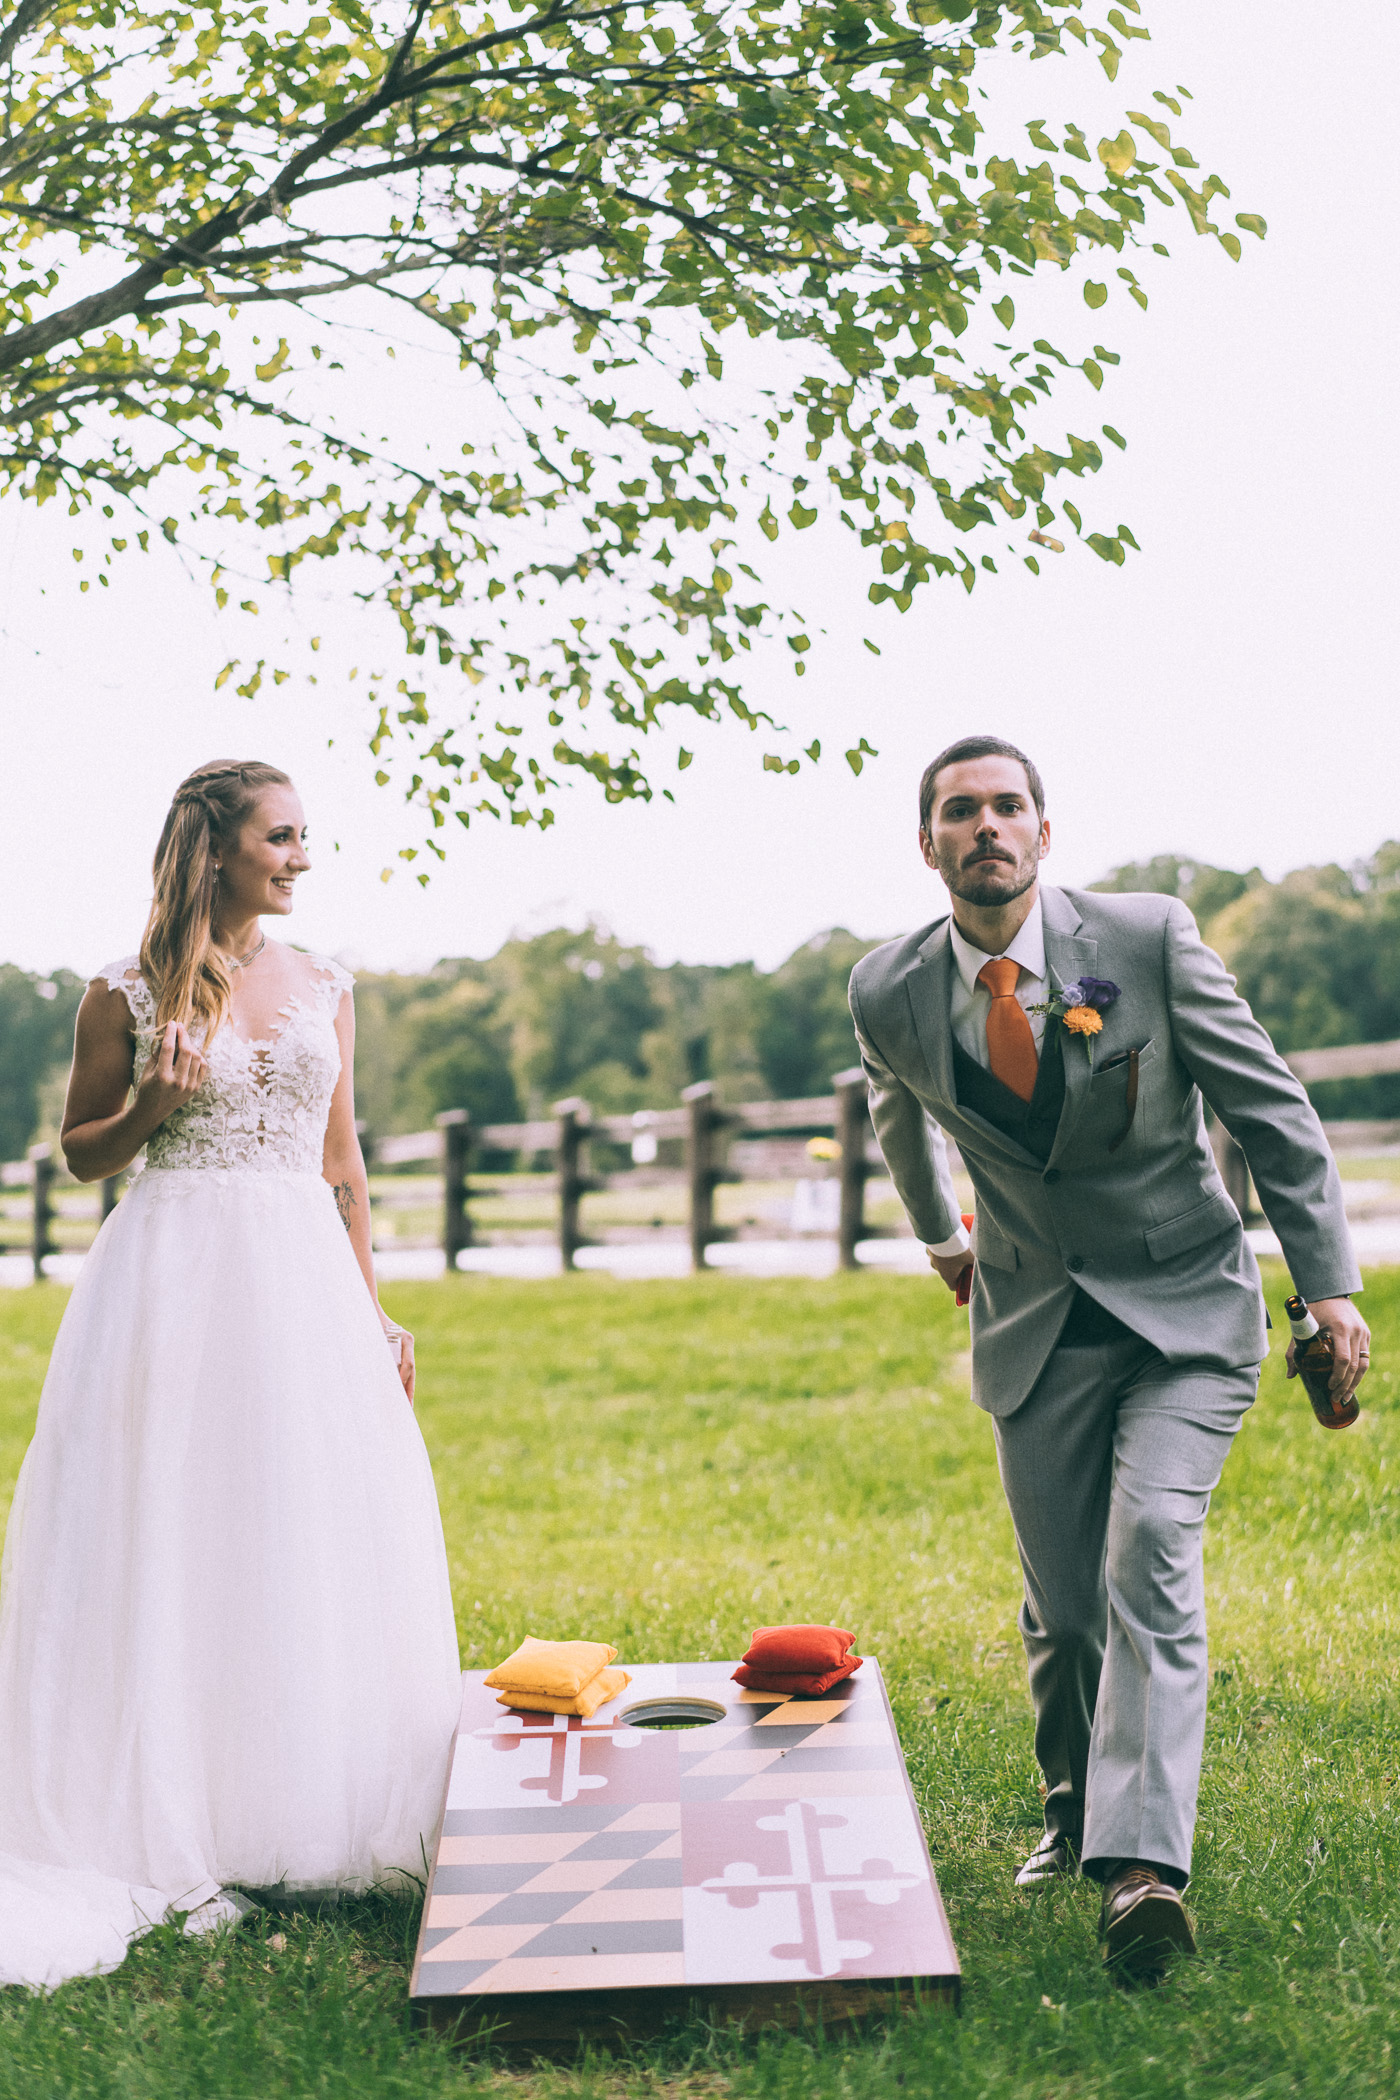 18-Faux Wedding-brandon shane warren-317.jpg